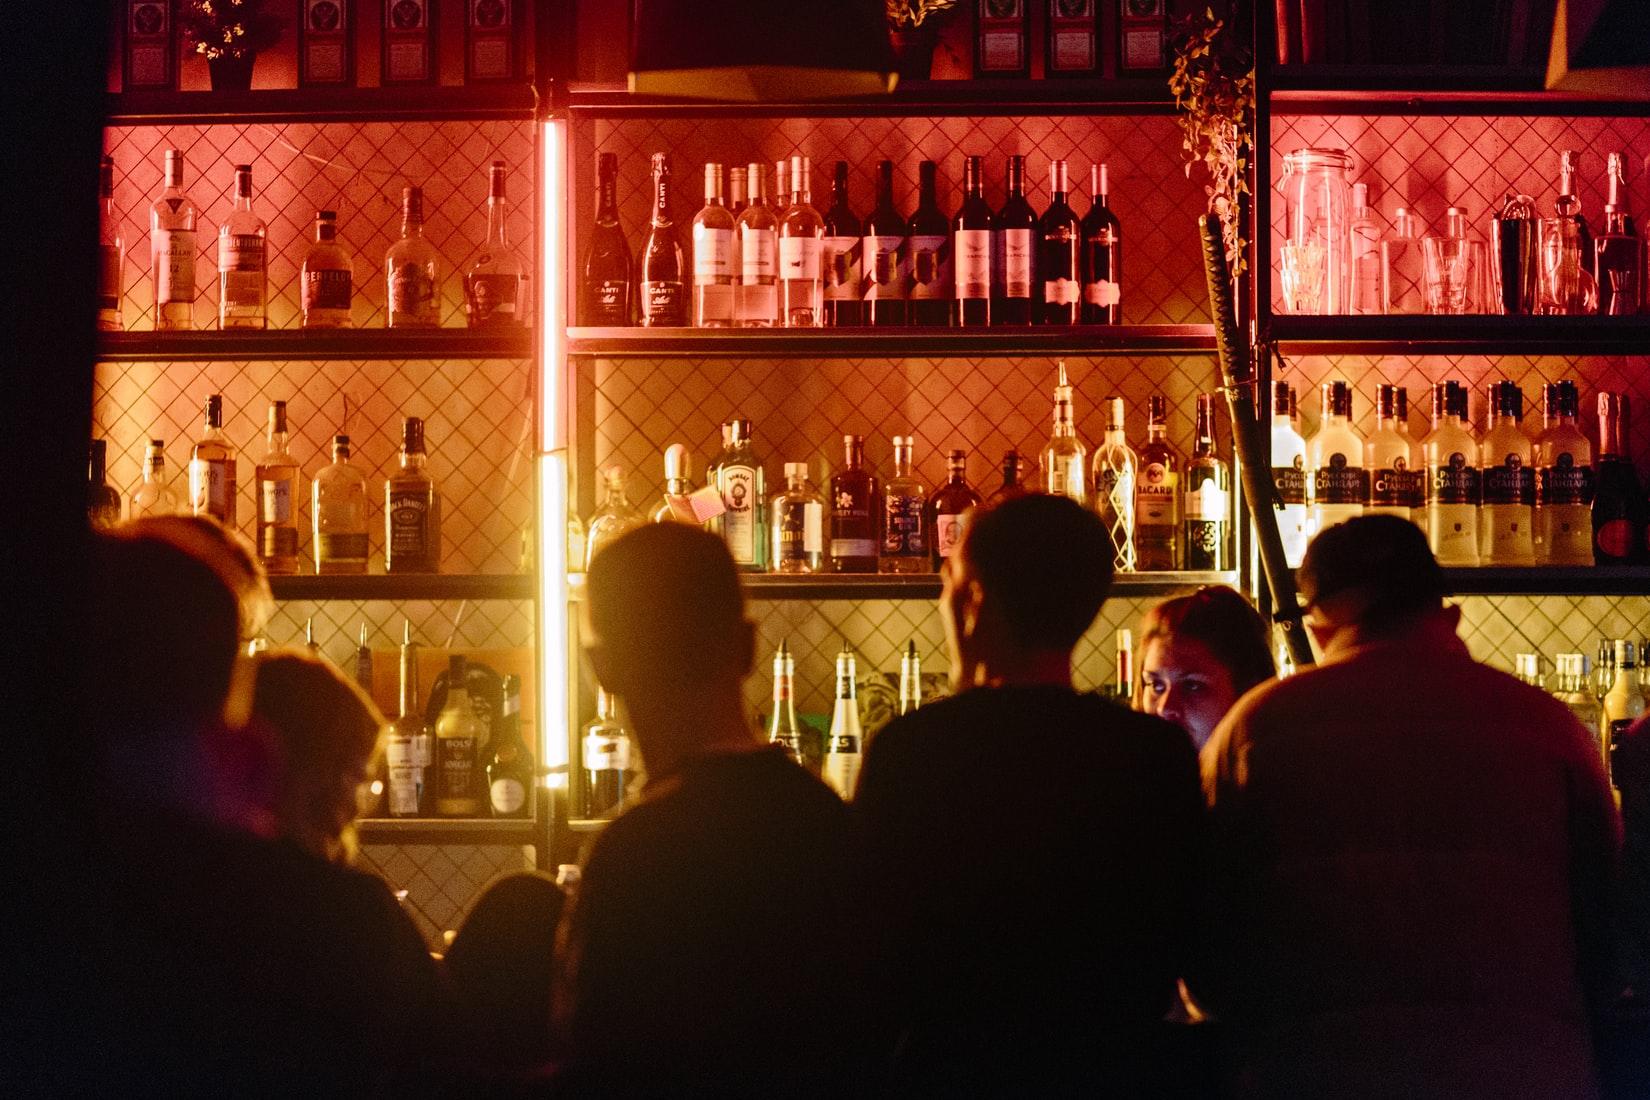 Best Bars in Cartagena, Colombia